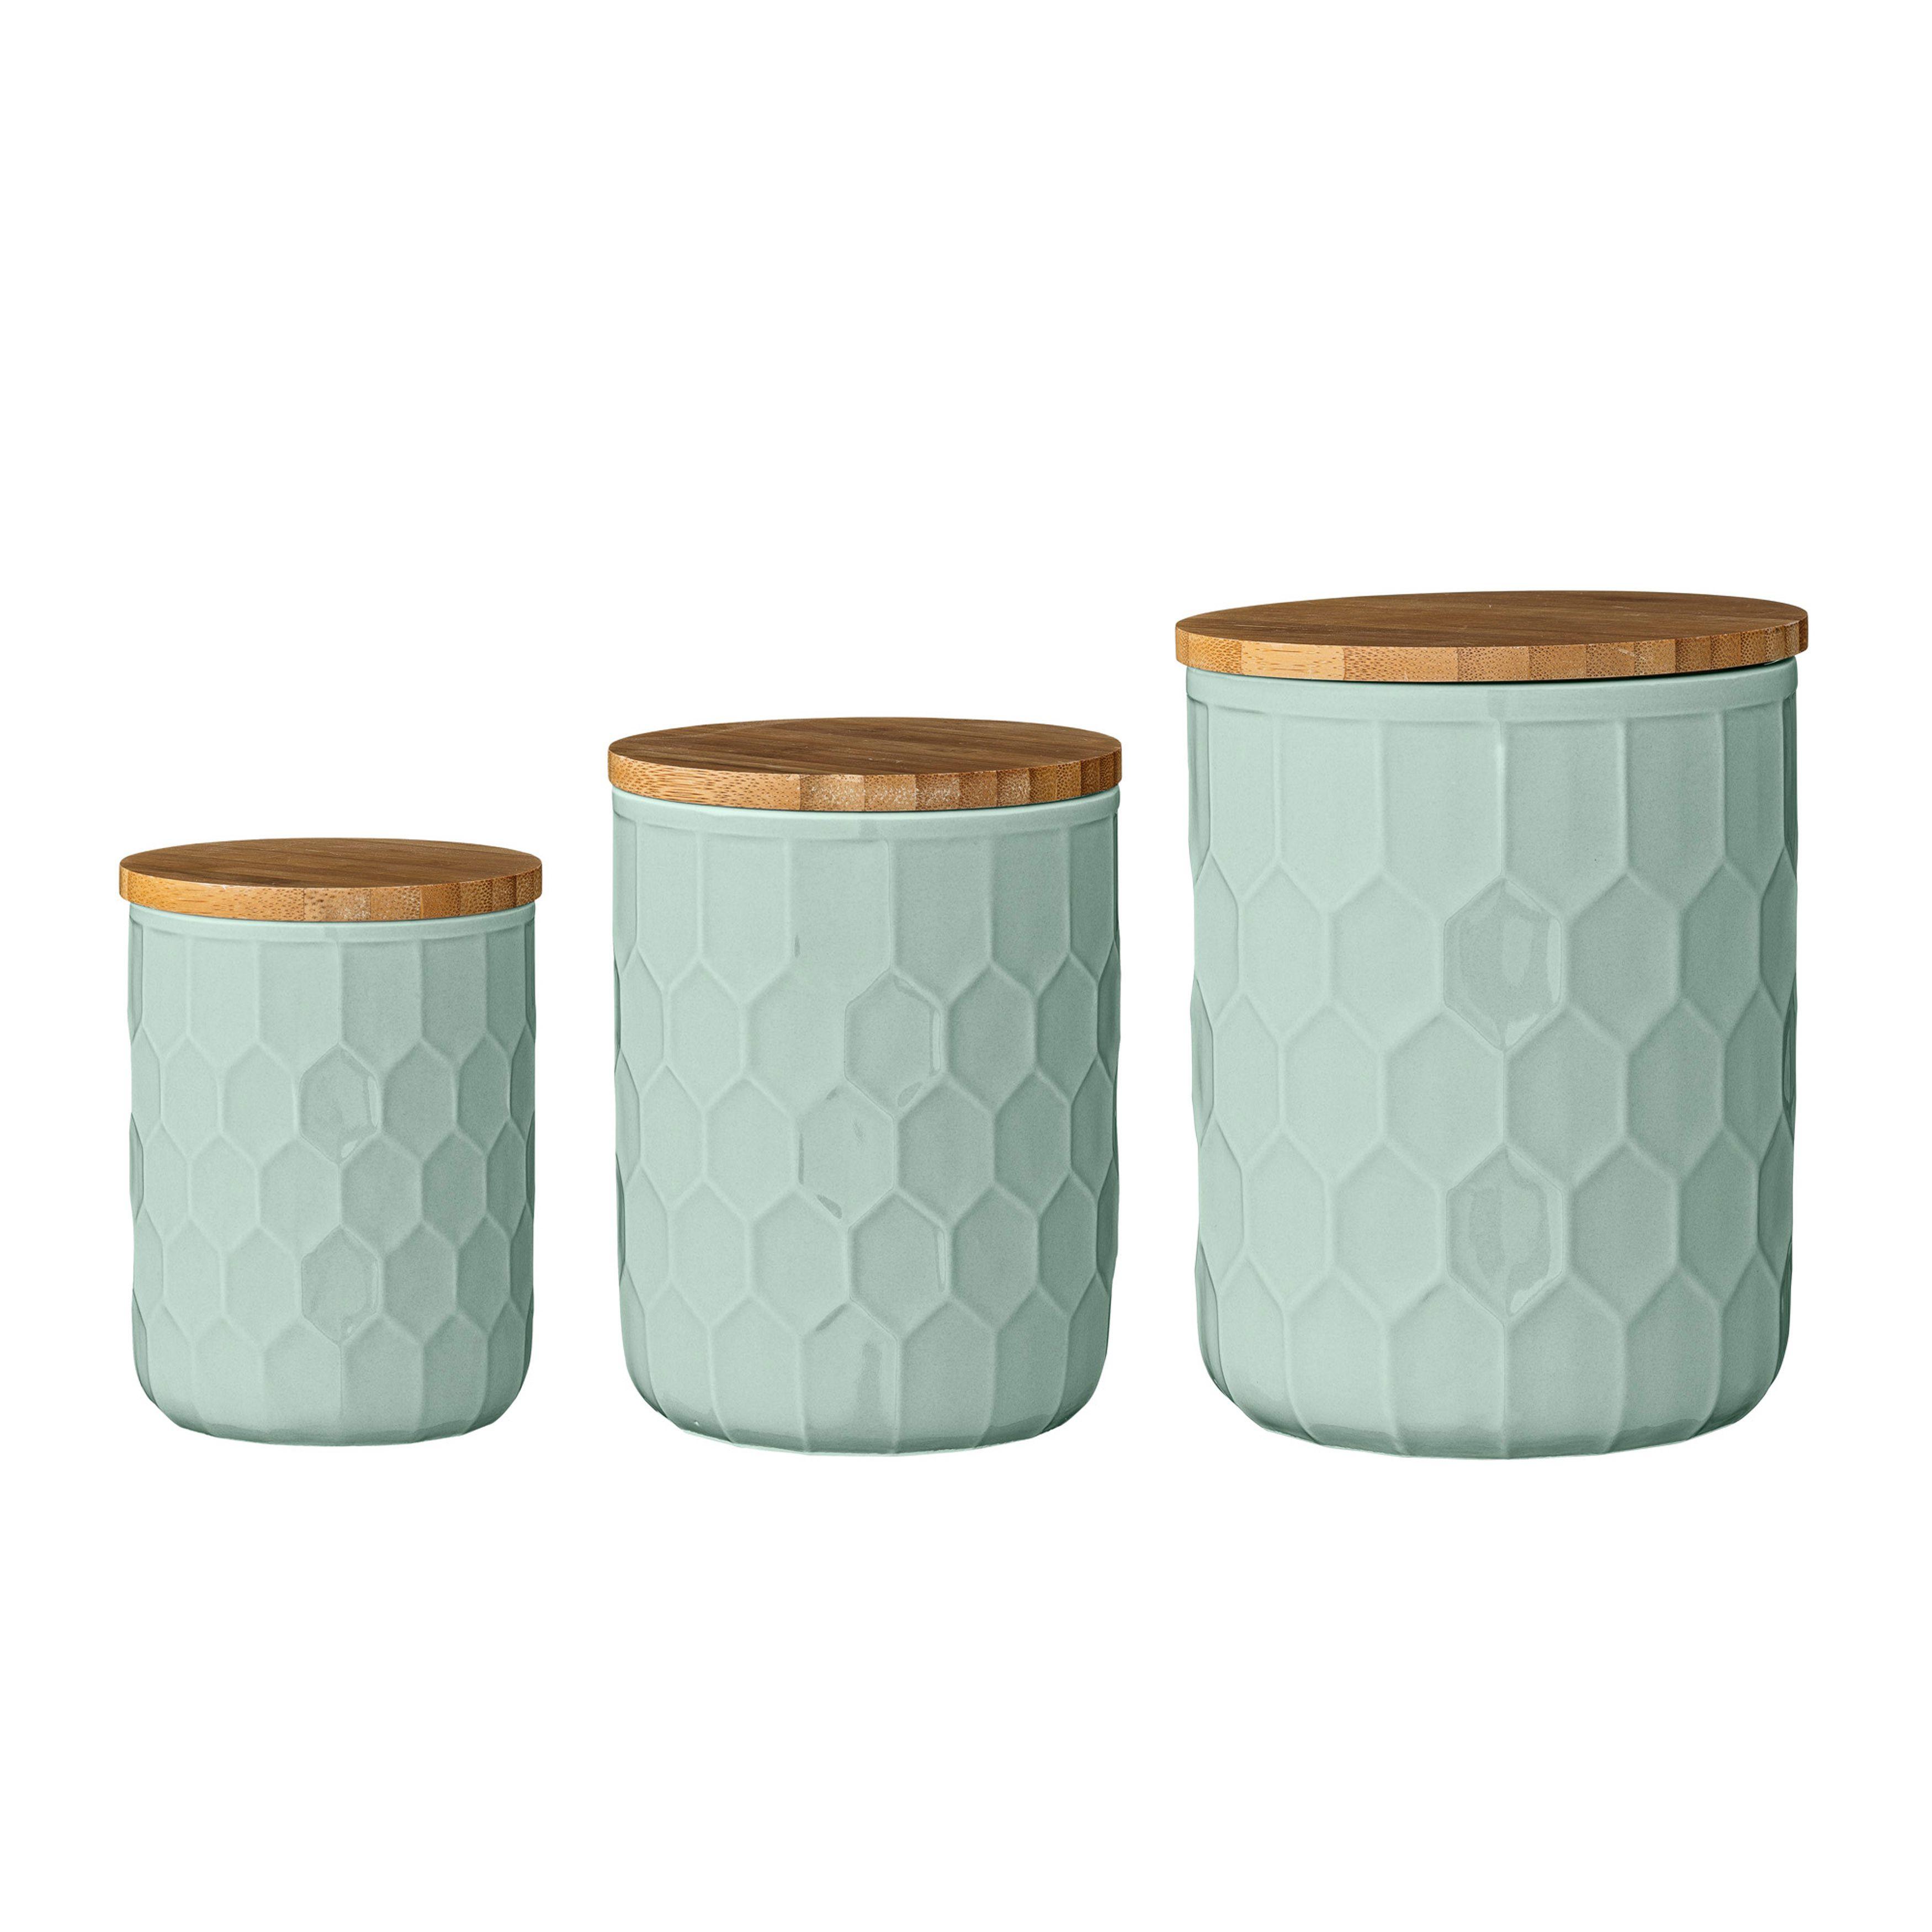 3 Piece Ceramic Jar with Bamboo Lid Set   Scandinavian food, Modern ...